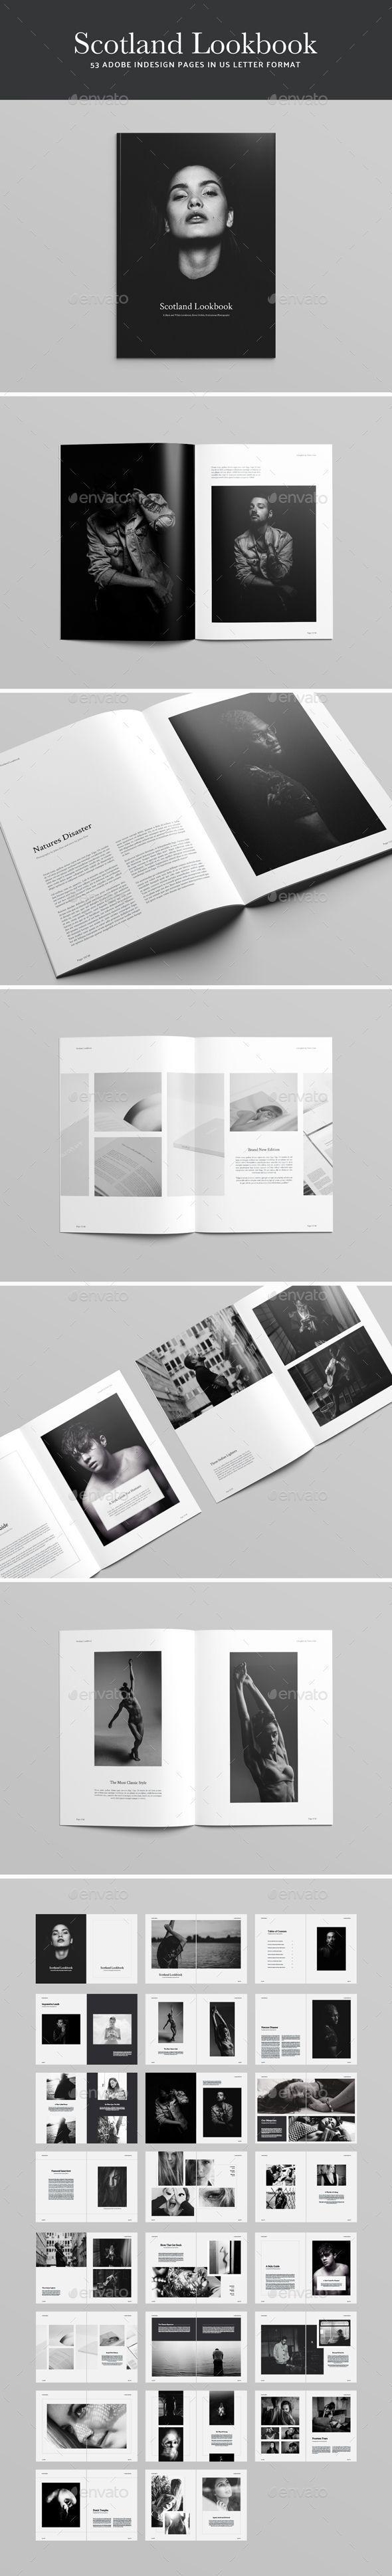 Scotland Lookbook   Magazine template, Indesign magazine templates ...